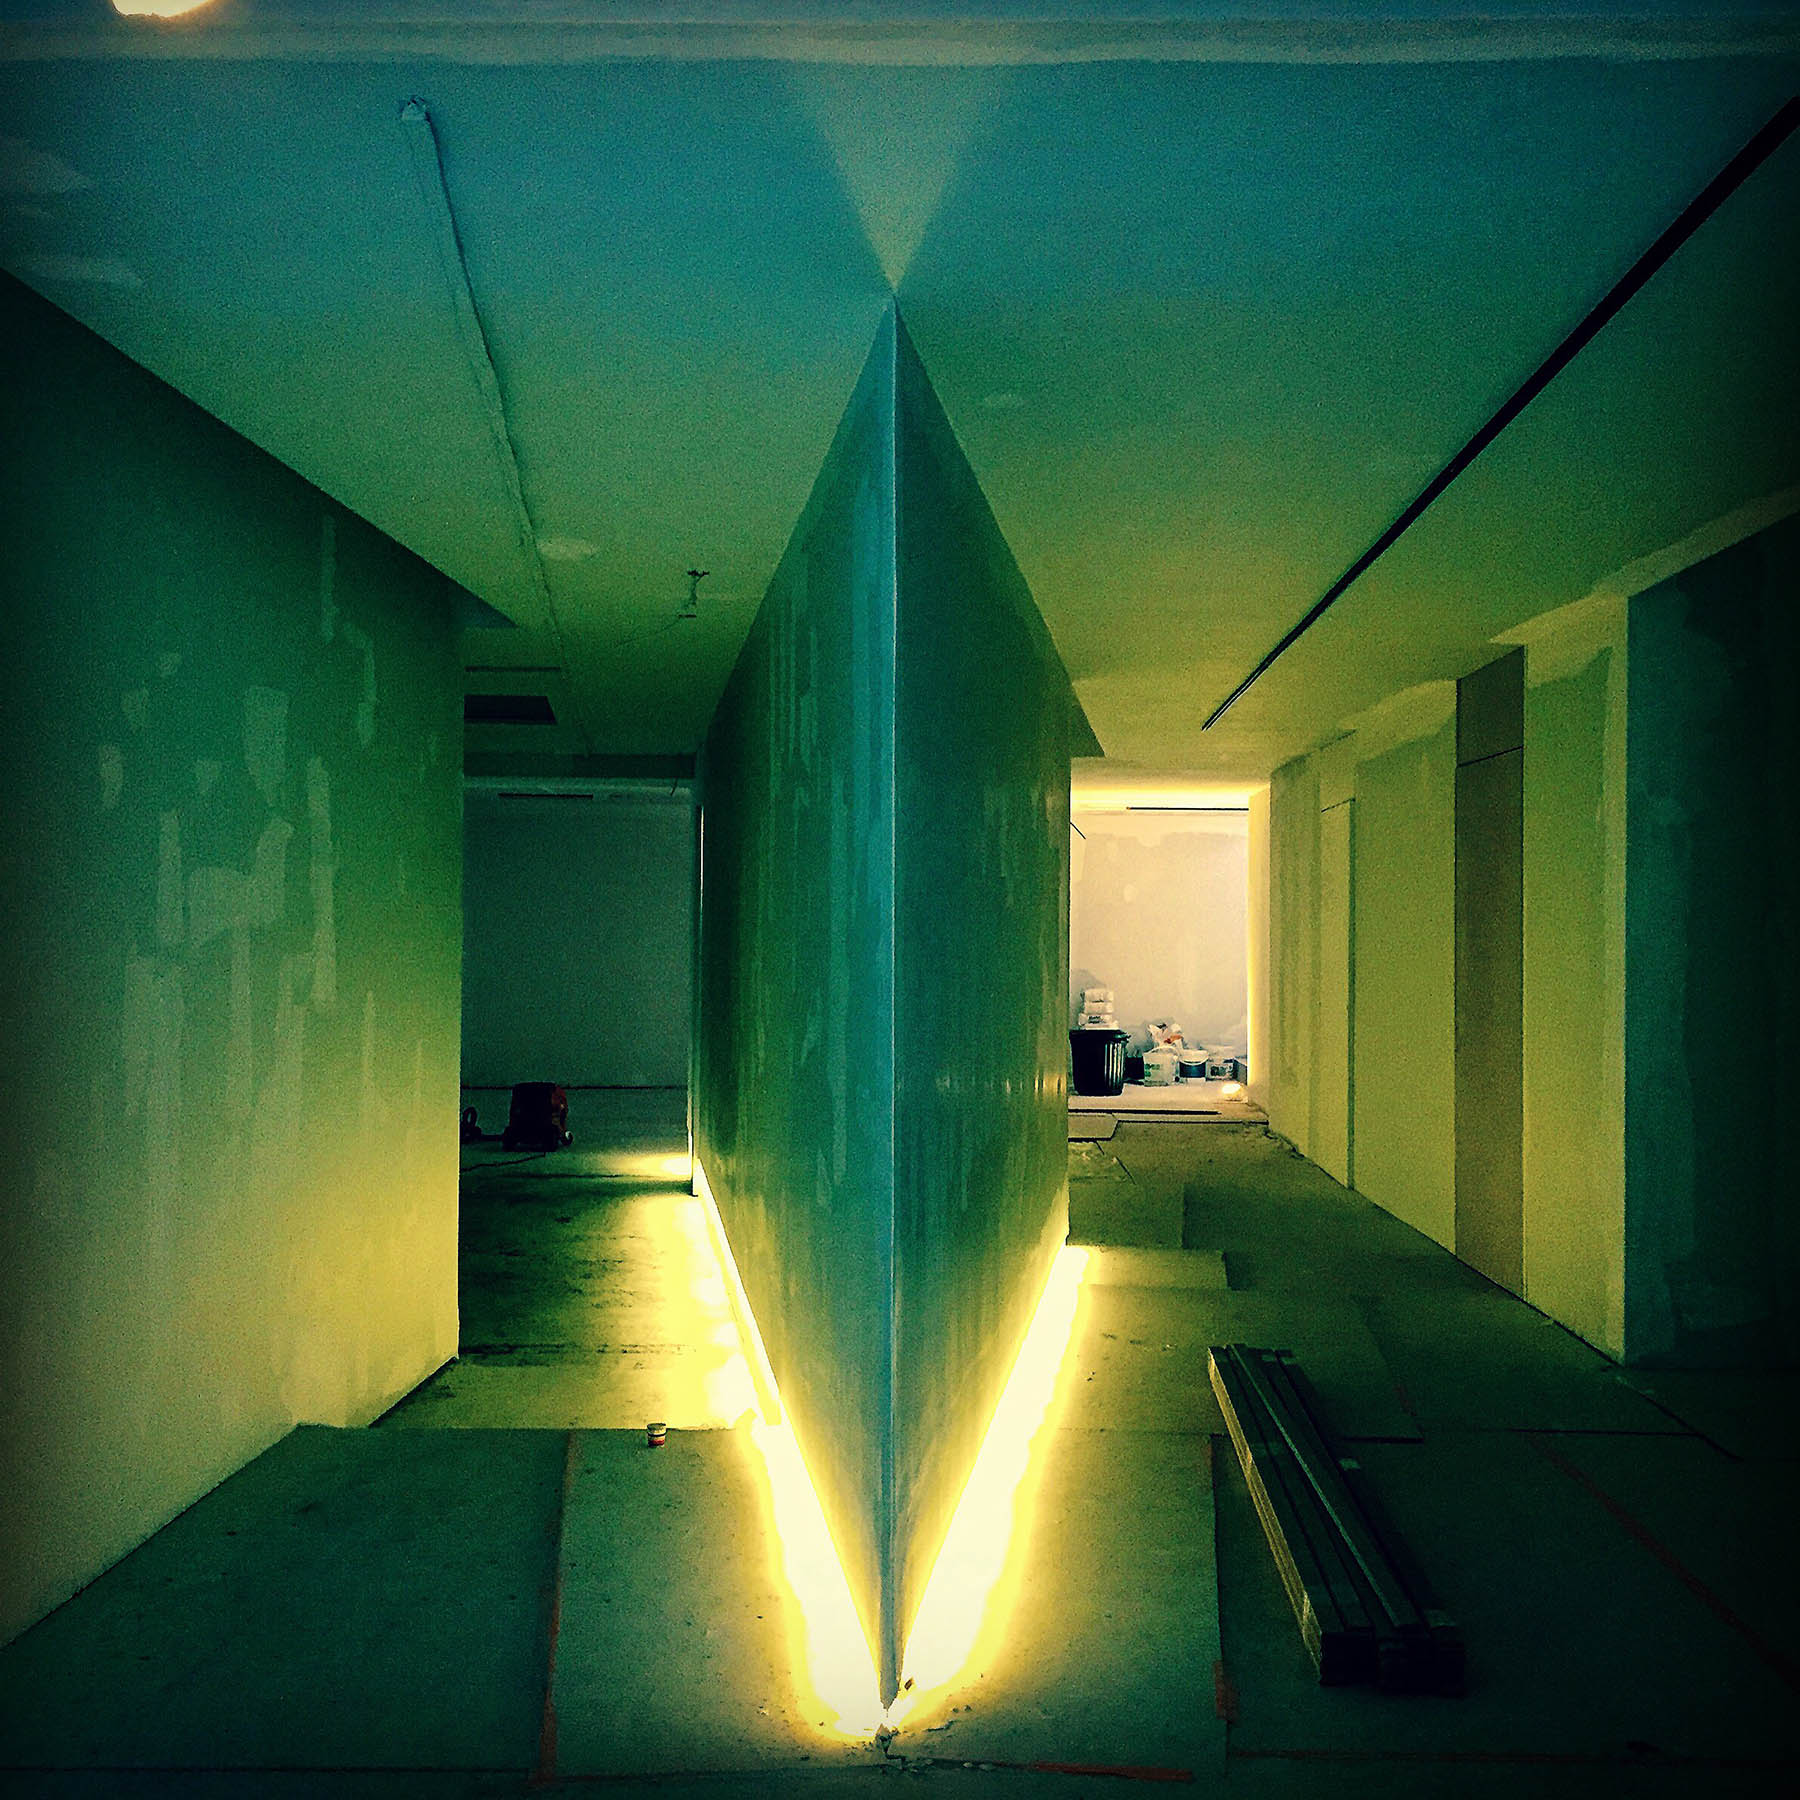 Galerie-PENTCHEFF-01.jpg